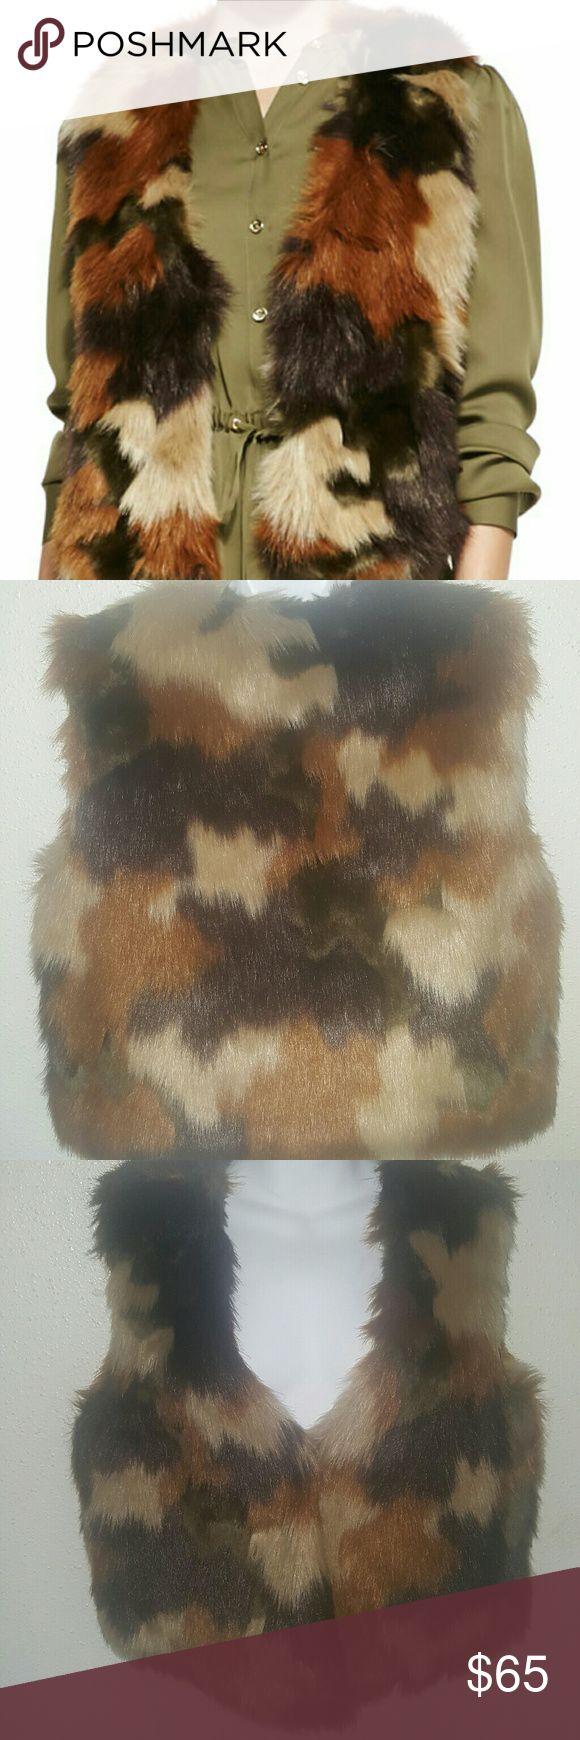 Vest Michael Kors camo faux fur Michael Kors Jackets & Coats Vests